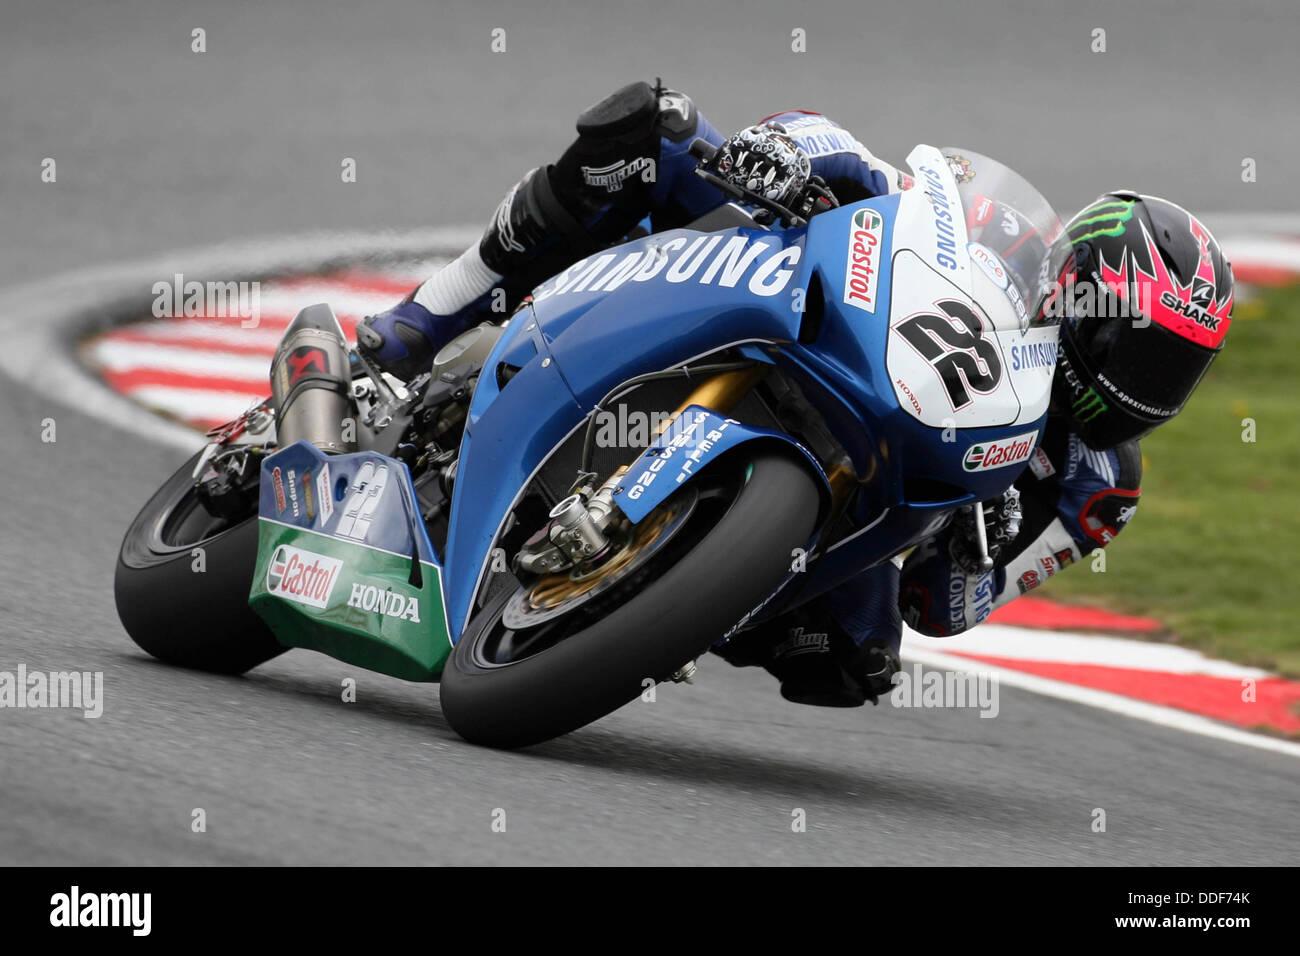 Alex Lowes, Samsung Honda, Oulton Park, 2013 British Superbike Championship - Stock Image